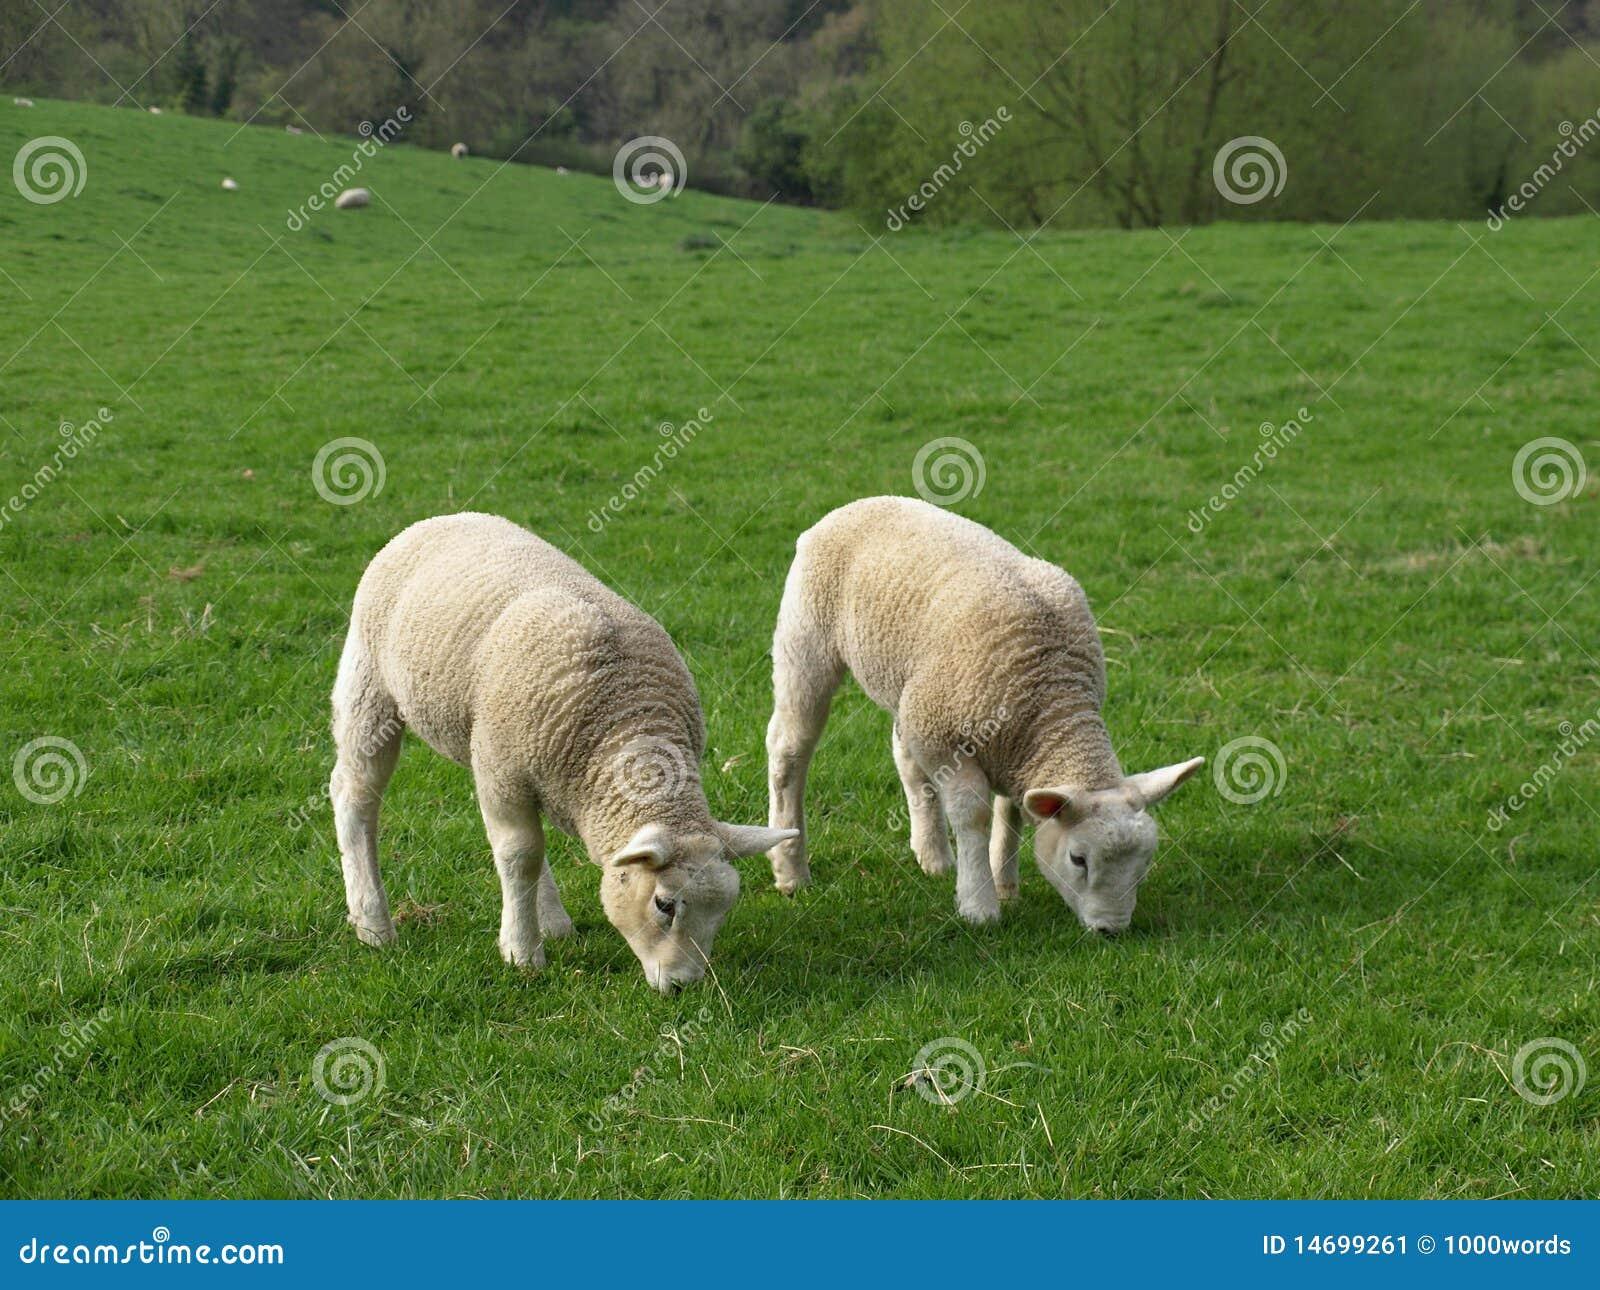 Grazing Lambs